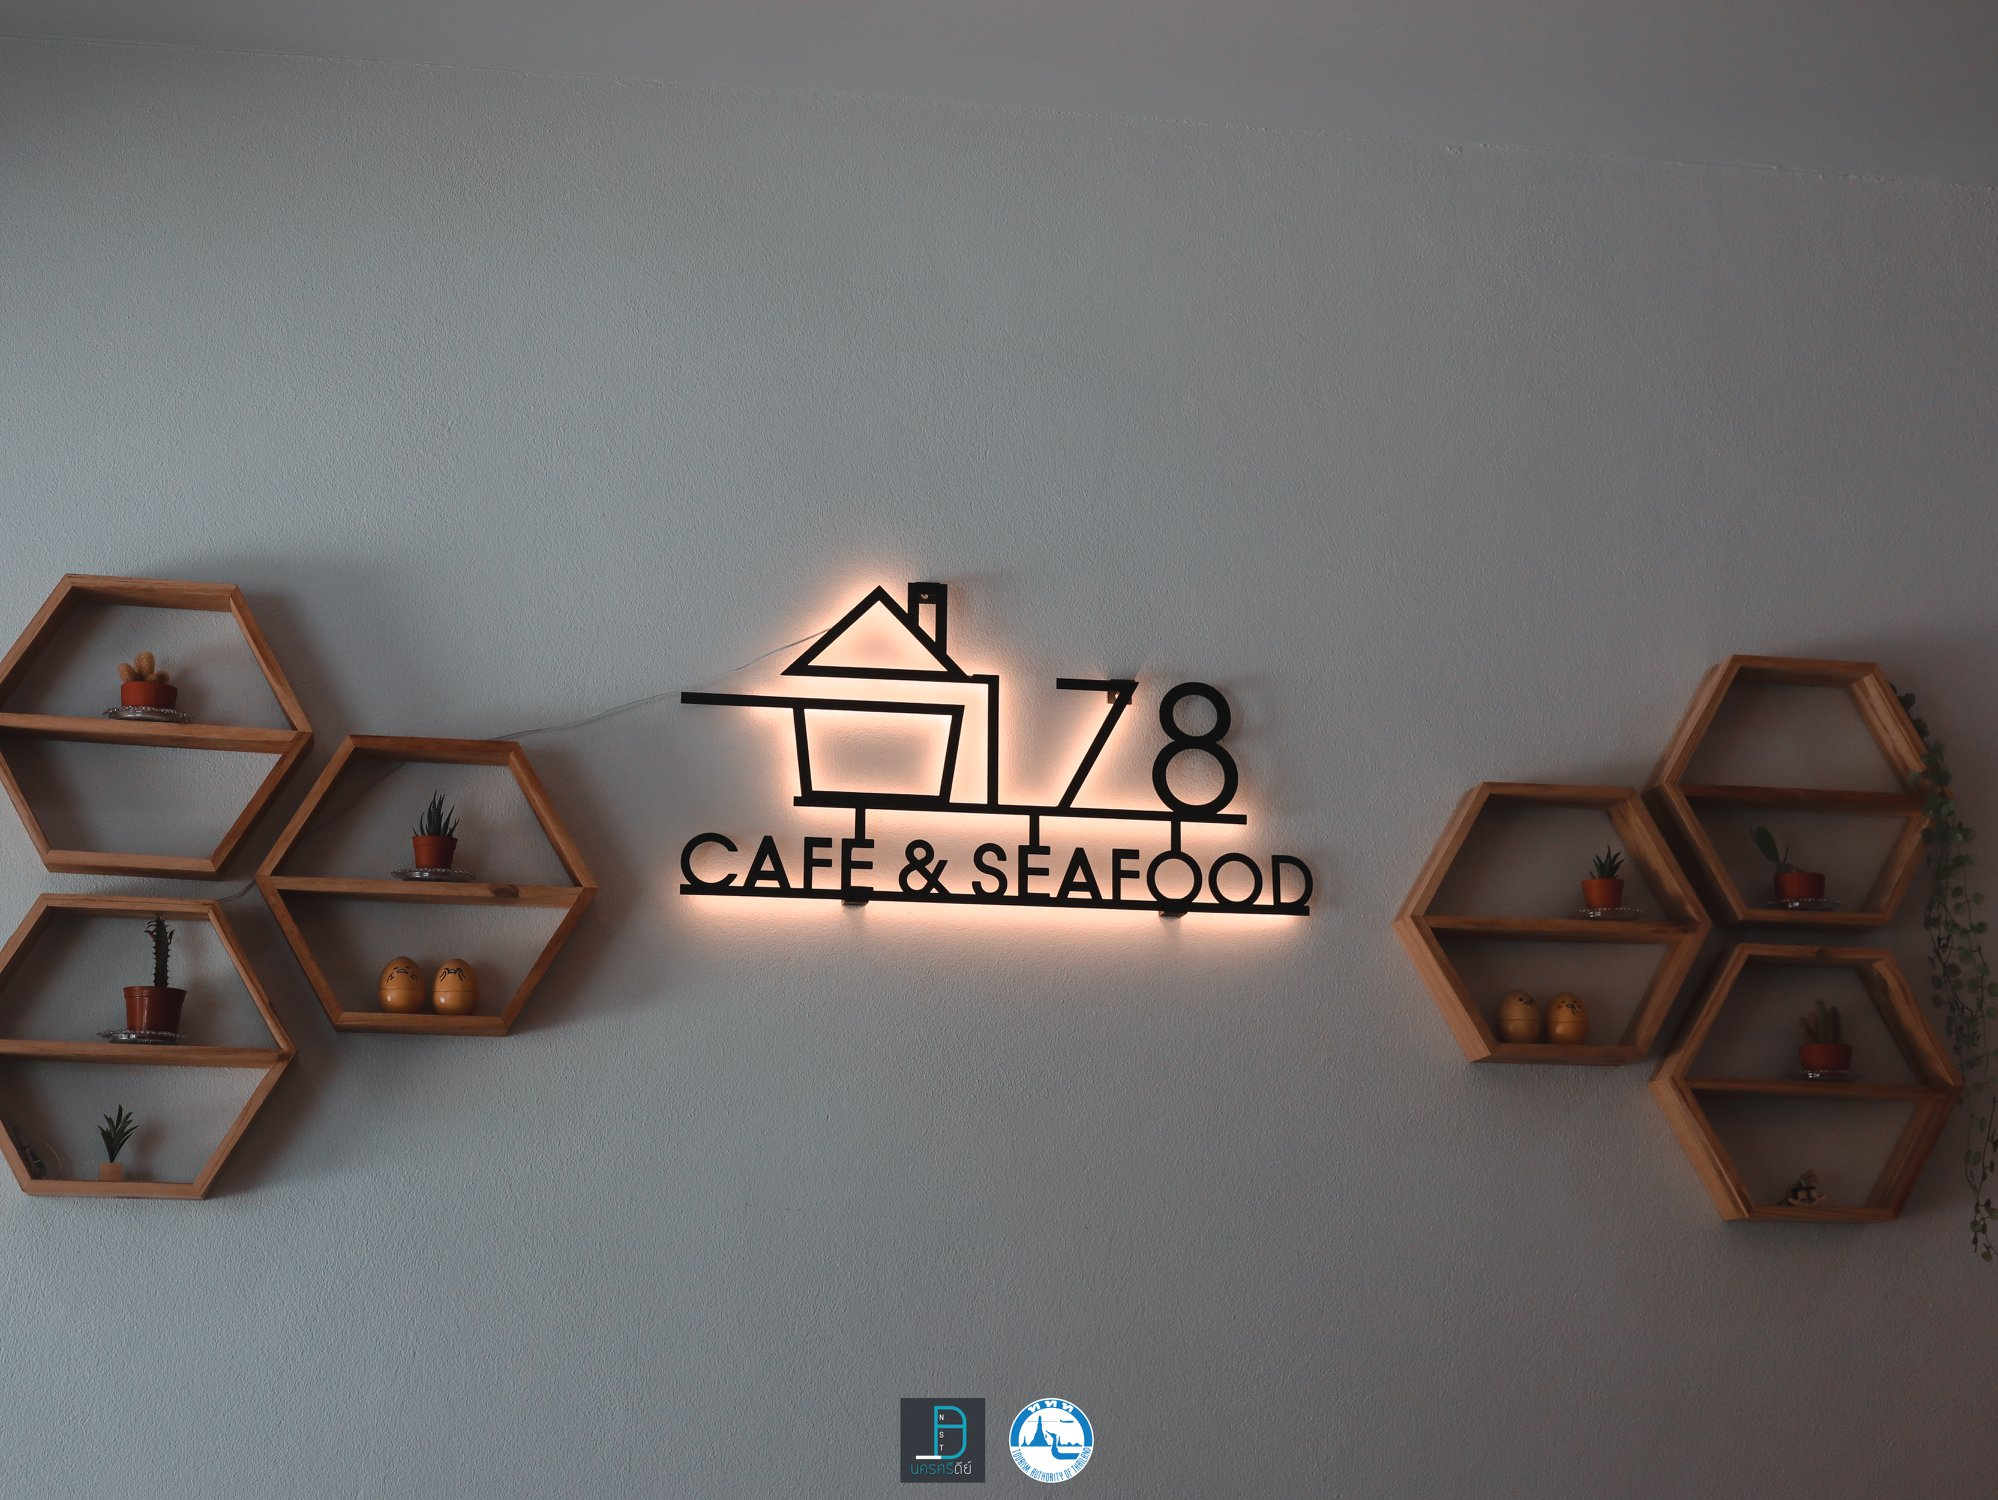 2.-178-Cafe-Seafood จัดไปสำหรับจุดนี้เป็นคาเฟ่-กับร้านอาหารสไตล์ซีฟู๊ด-ขอบอกว่าเด็ดดดด คาเฟ่,สตูล,เด็ด,จุดเช็คอิน,อร่อย,ร้านอาหาร,จุดถ่ายรูป,สถานที่ท่องเที่ยว